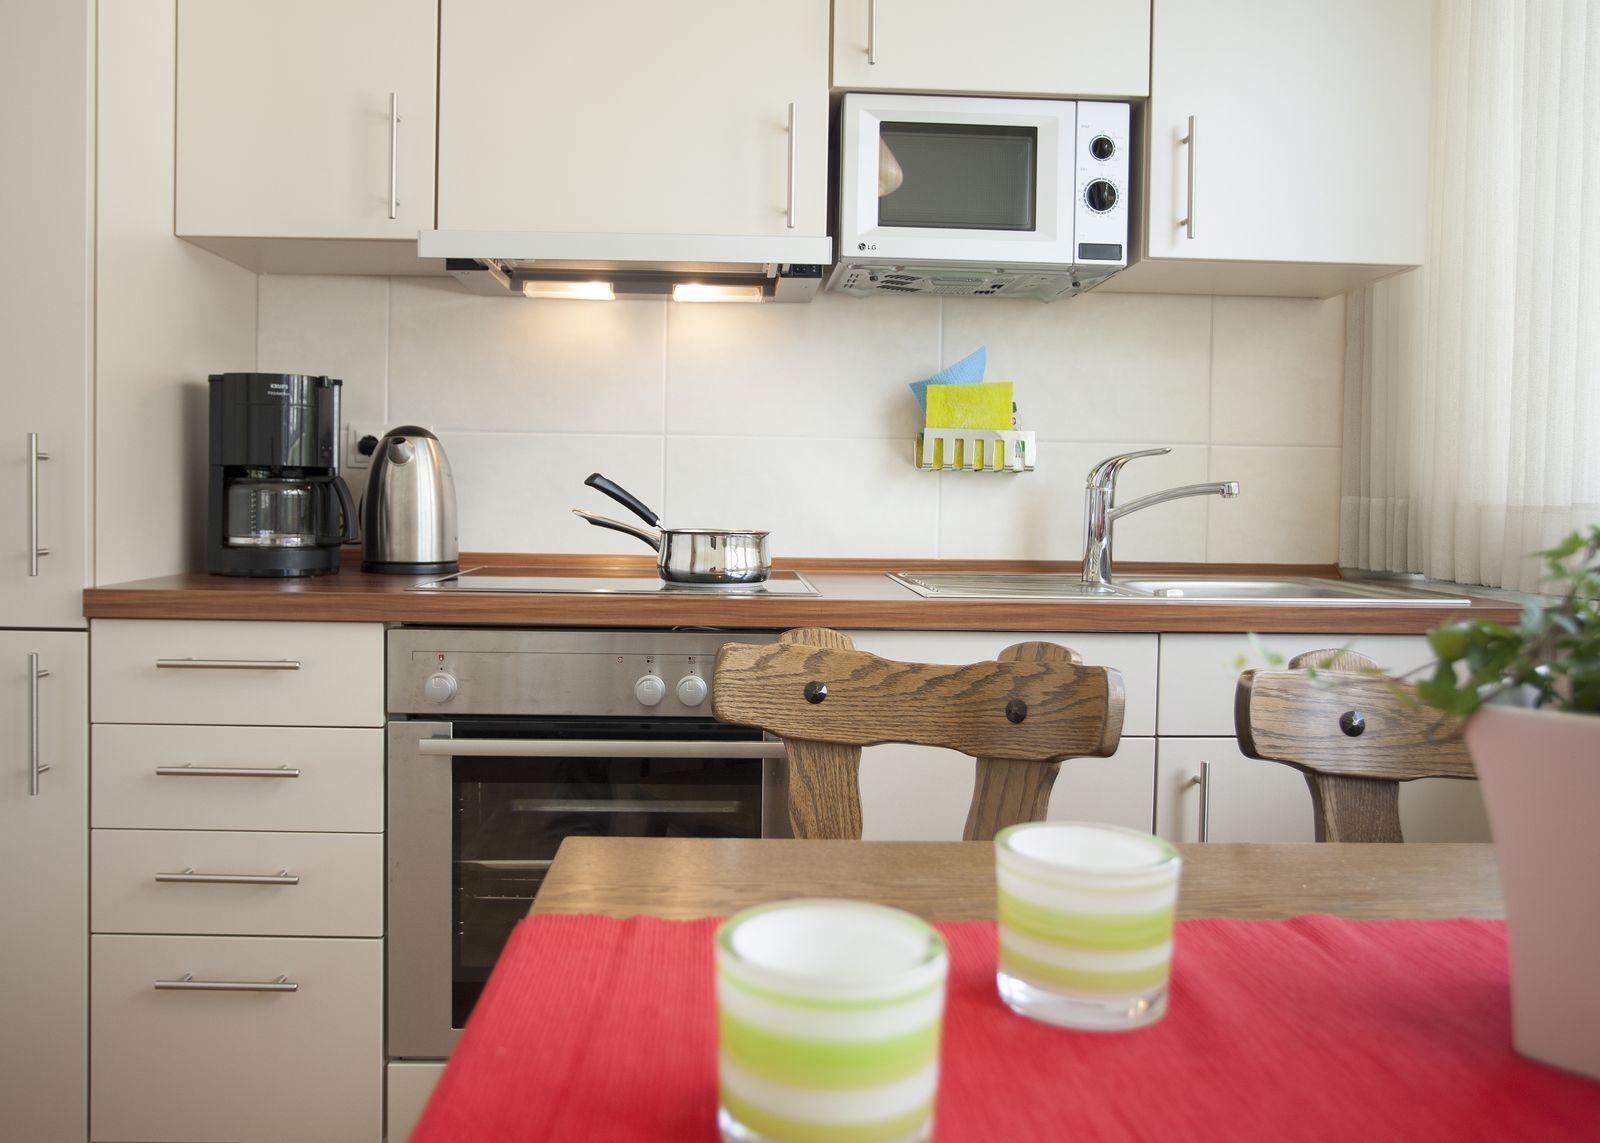 Apartment - Am Waltenberg 55-I